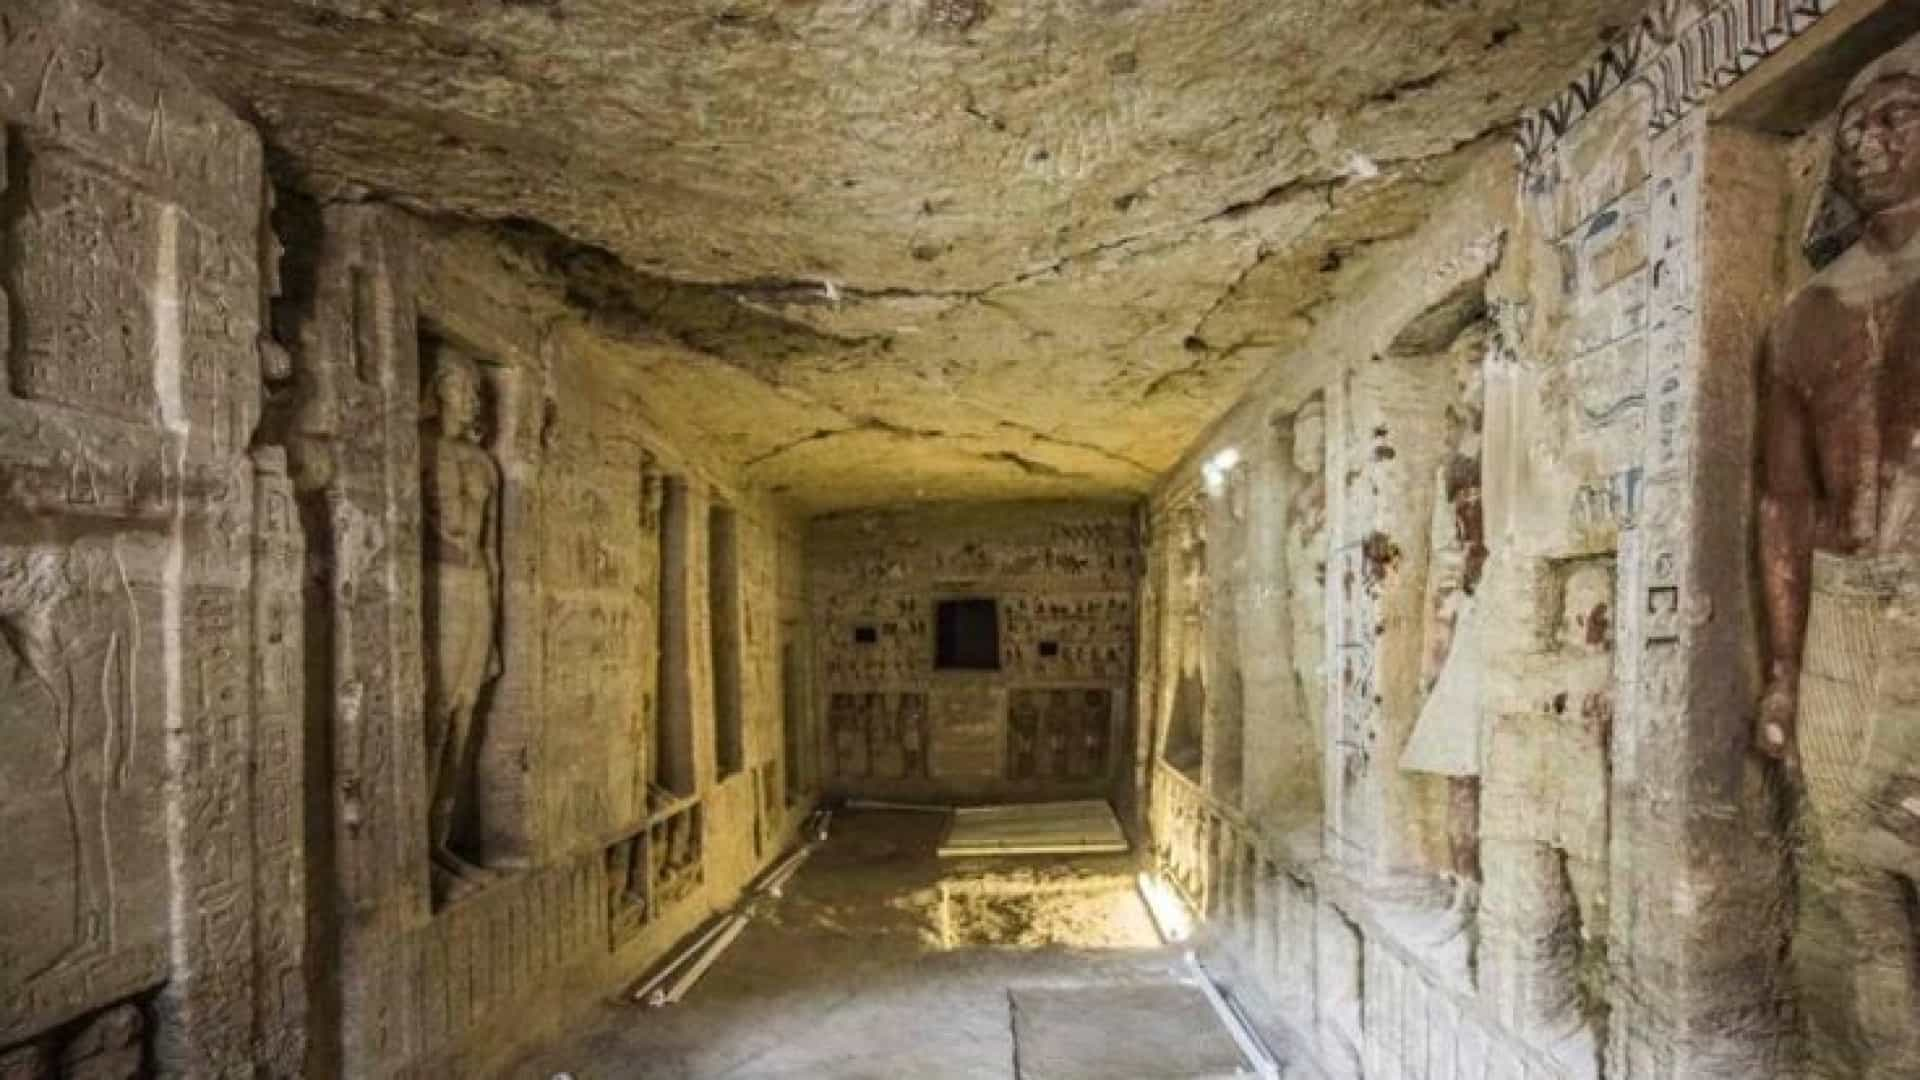 Túmulo de 4.400 anos descoberto no Egito